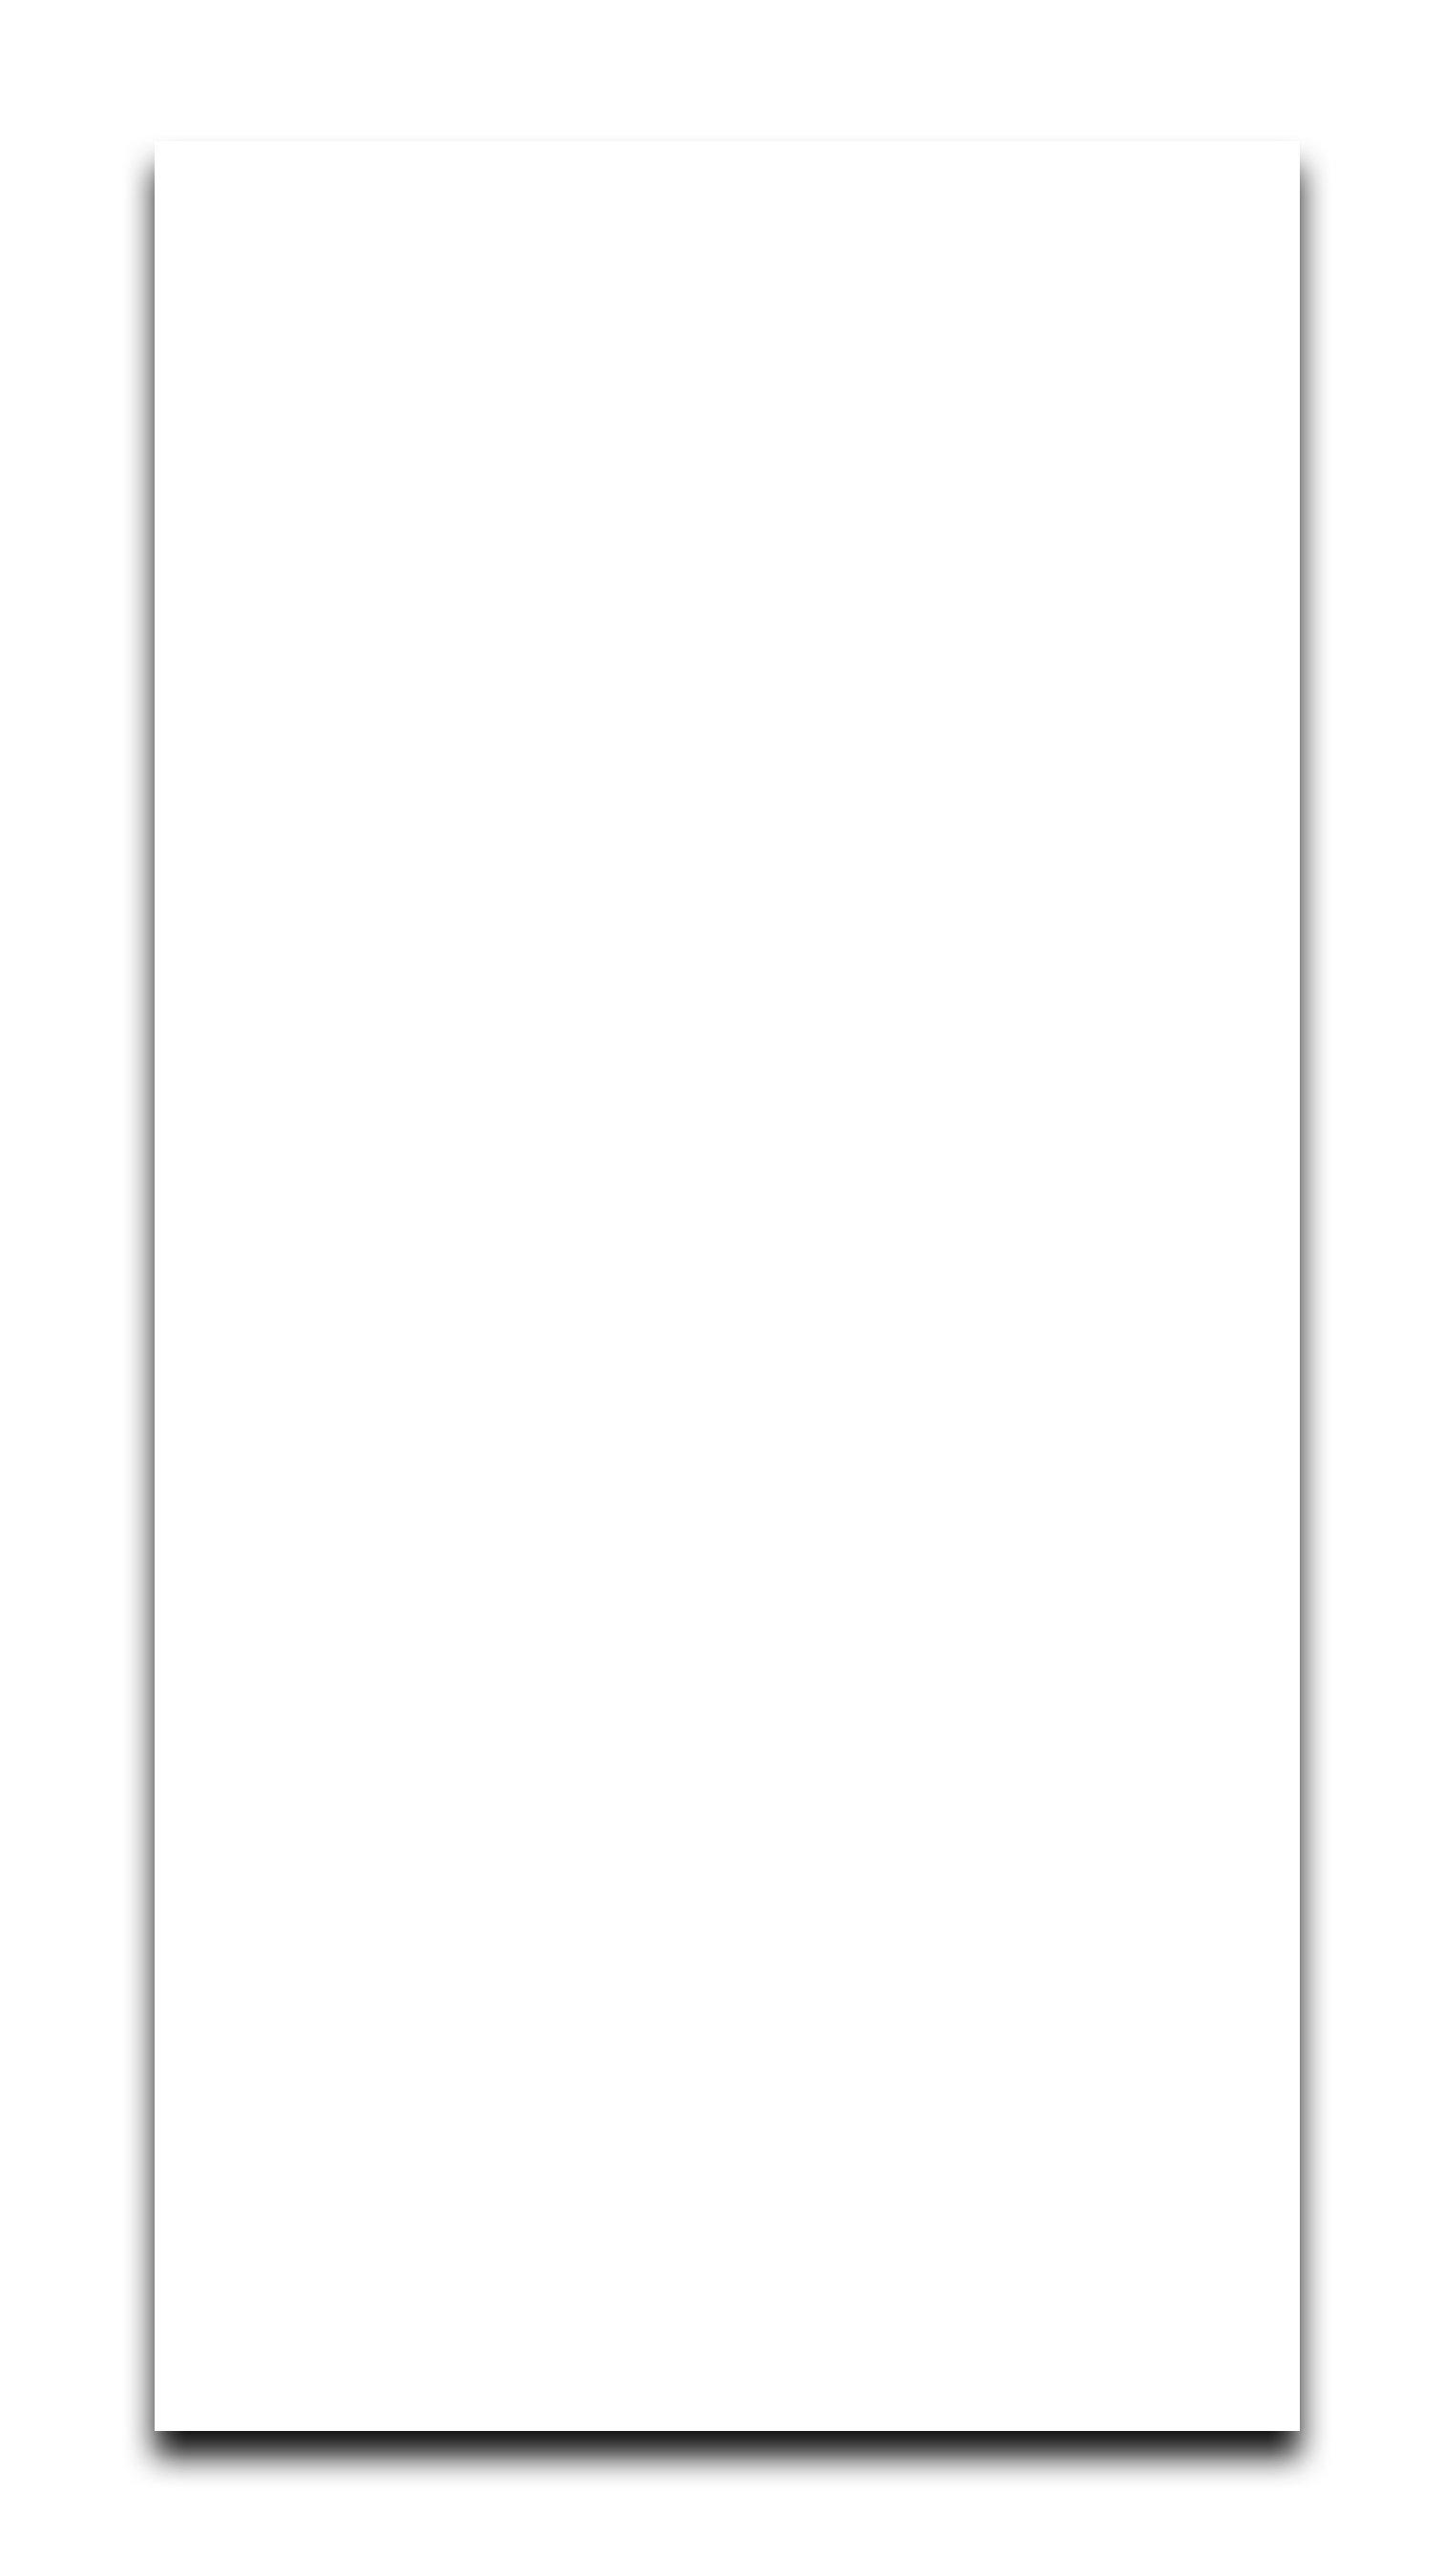 4x8 Flat Card 1-Sided (DIY) (duplicate) - Mike's Camera